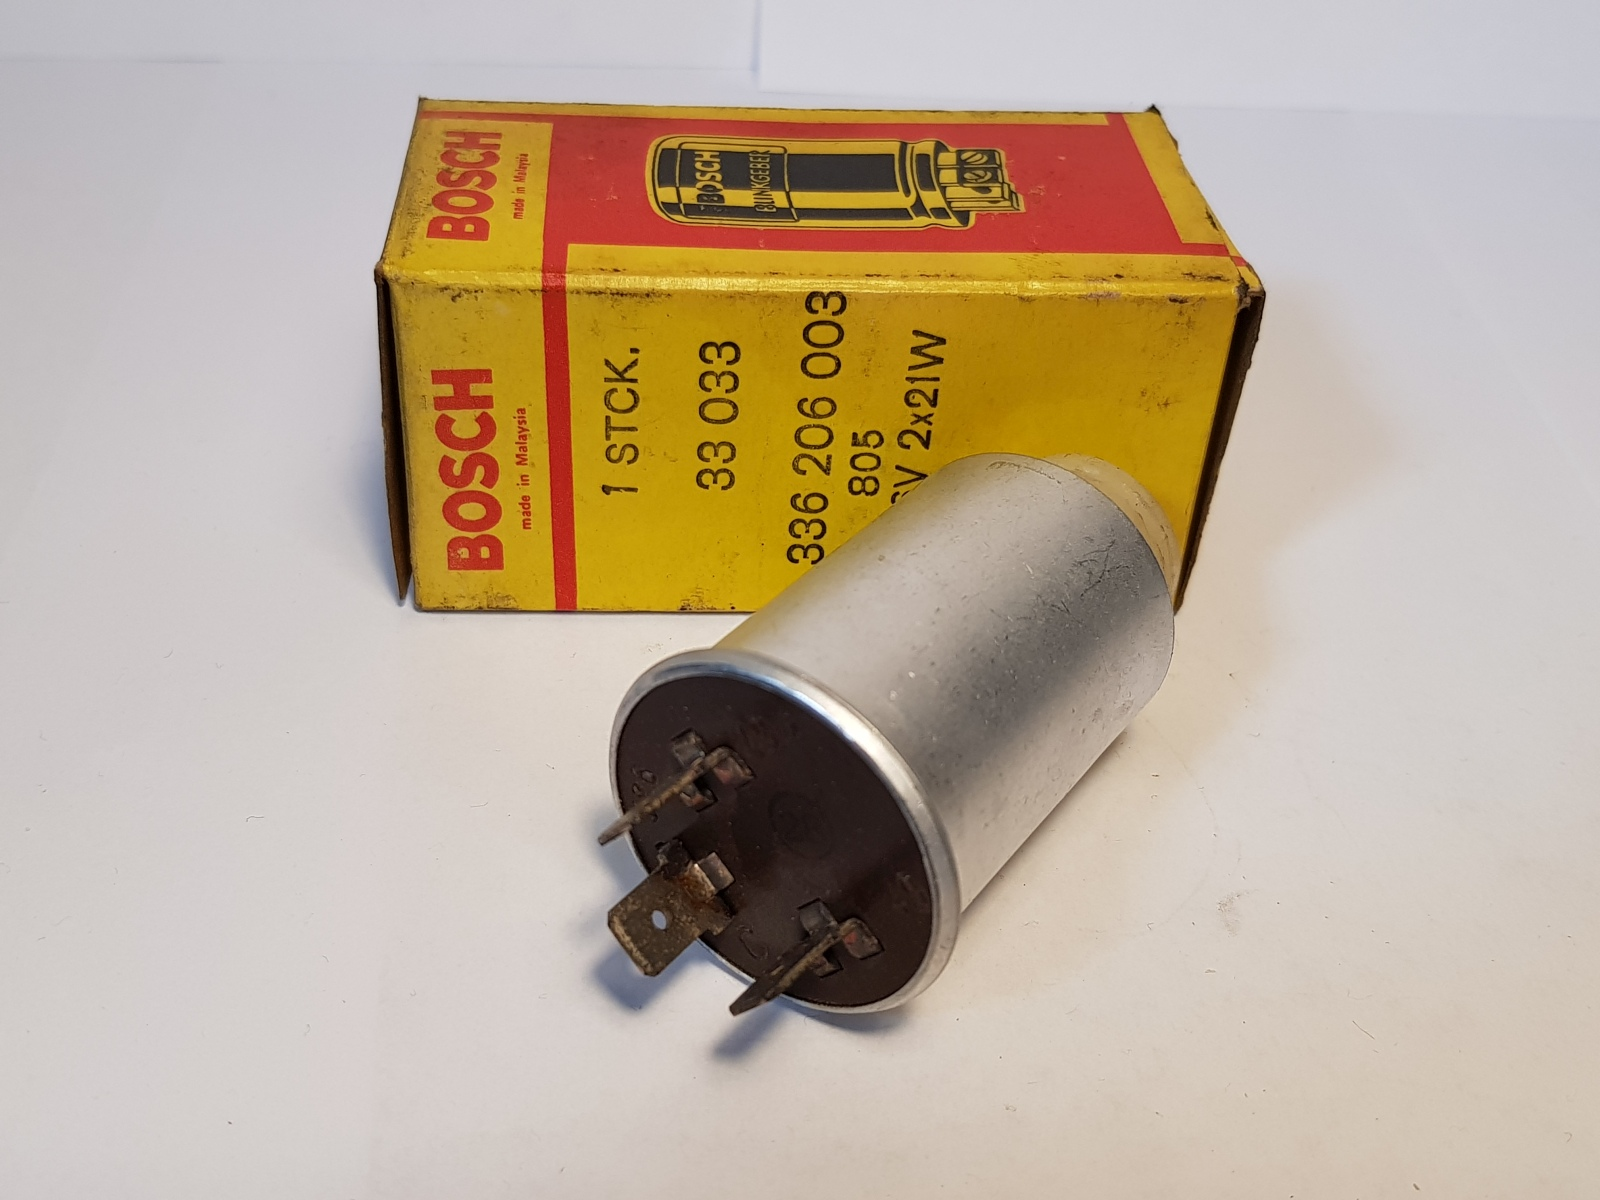 Bosch 0336206003 Blinkgeber Blinkergeber 6V 1180128 Elektrisch Indicator Unit